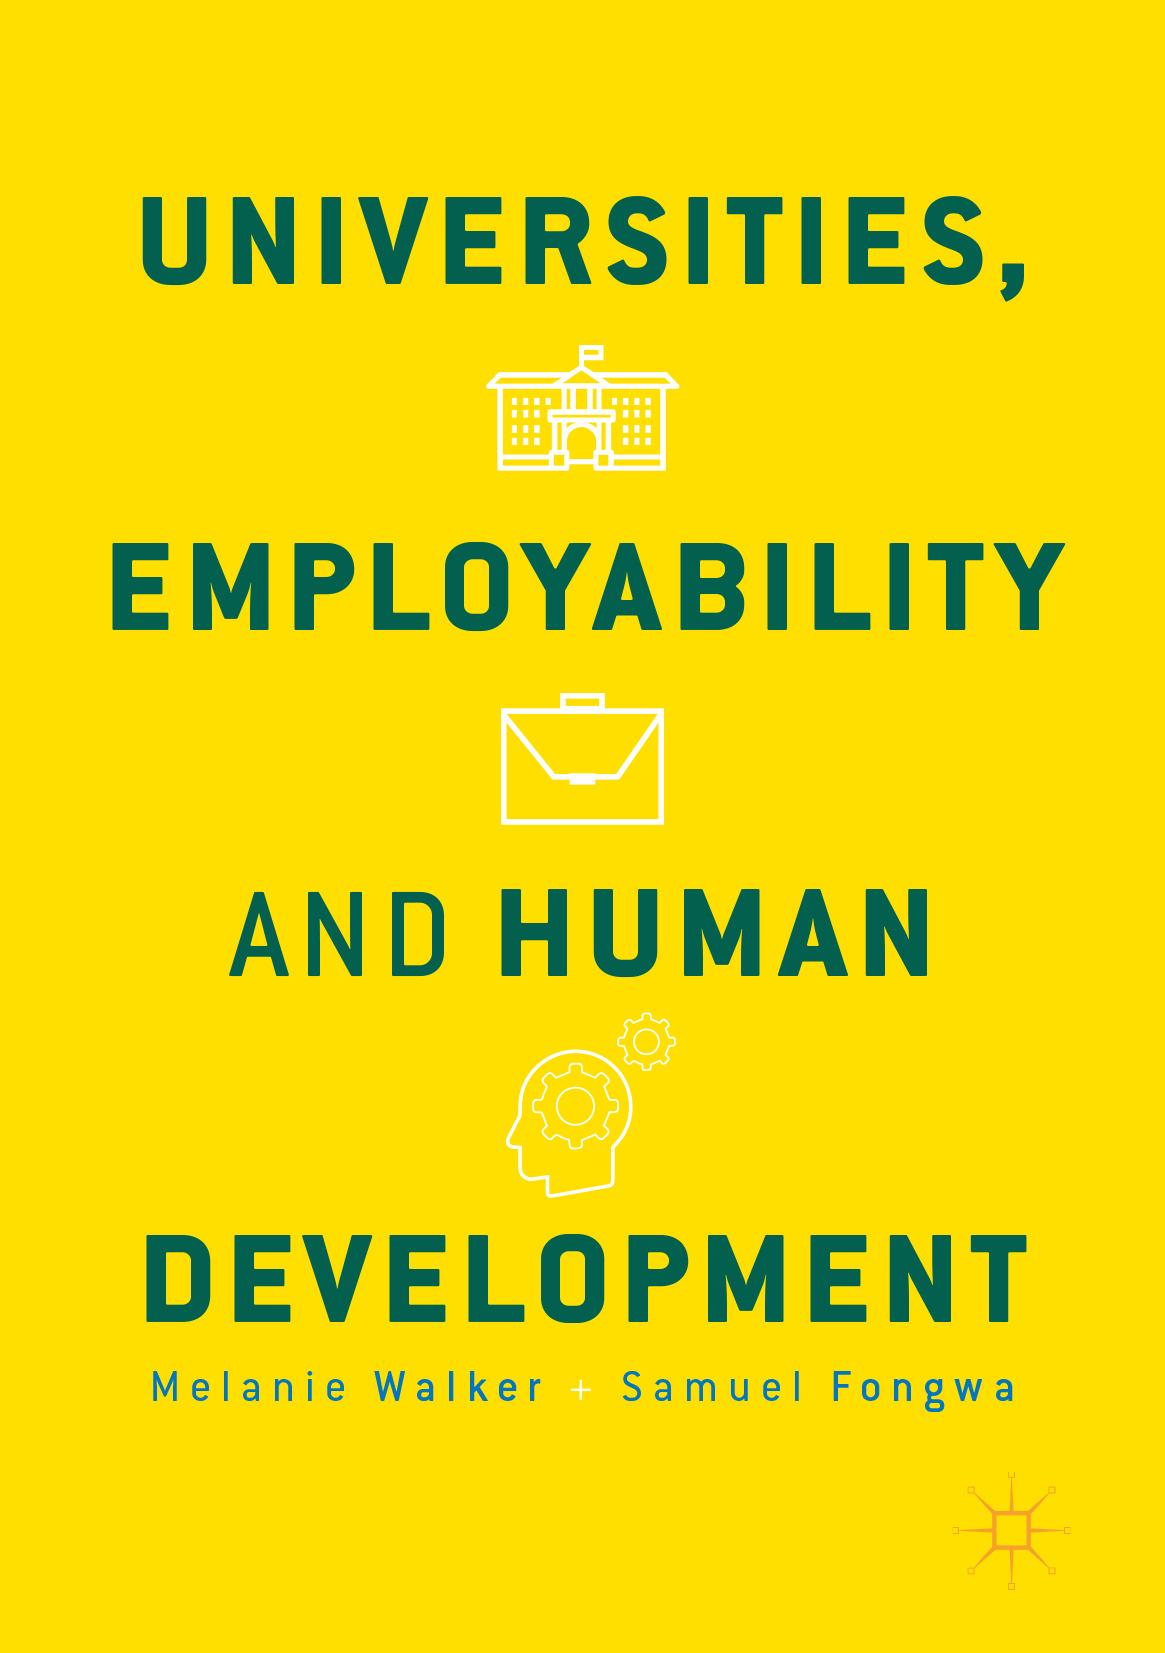 Fongwa, Samuel - Universities, Employability and Human Development, ebook